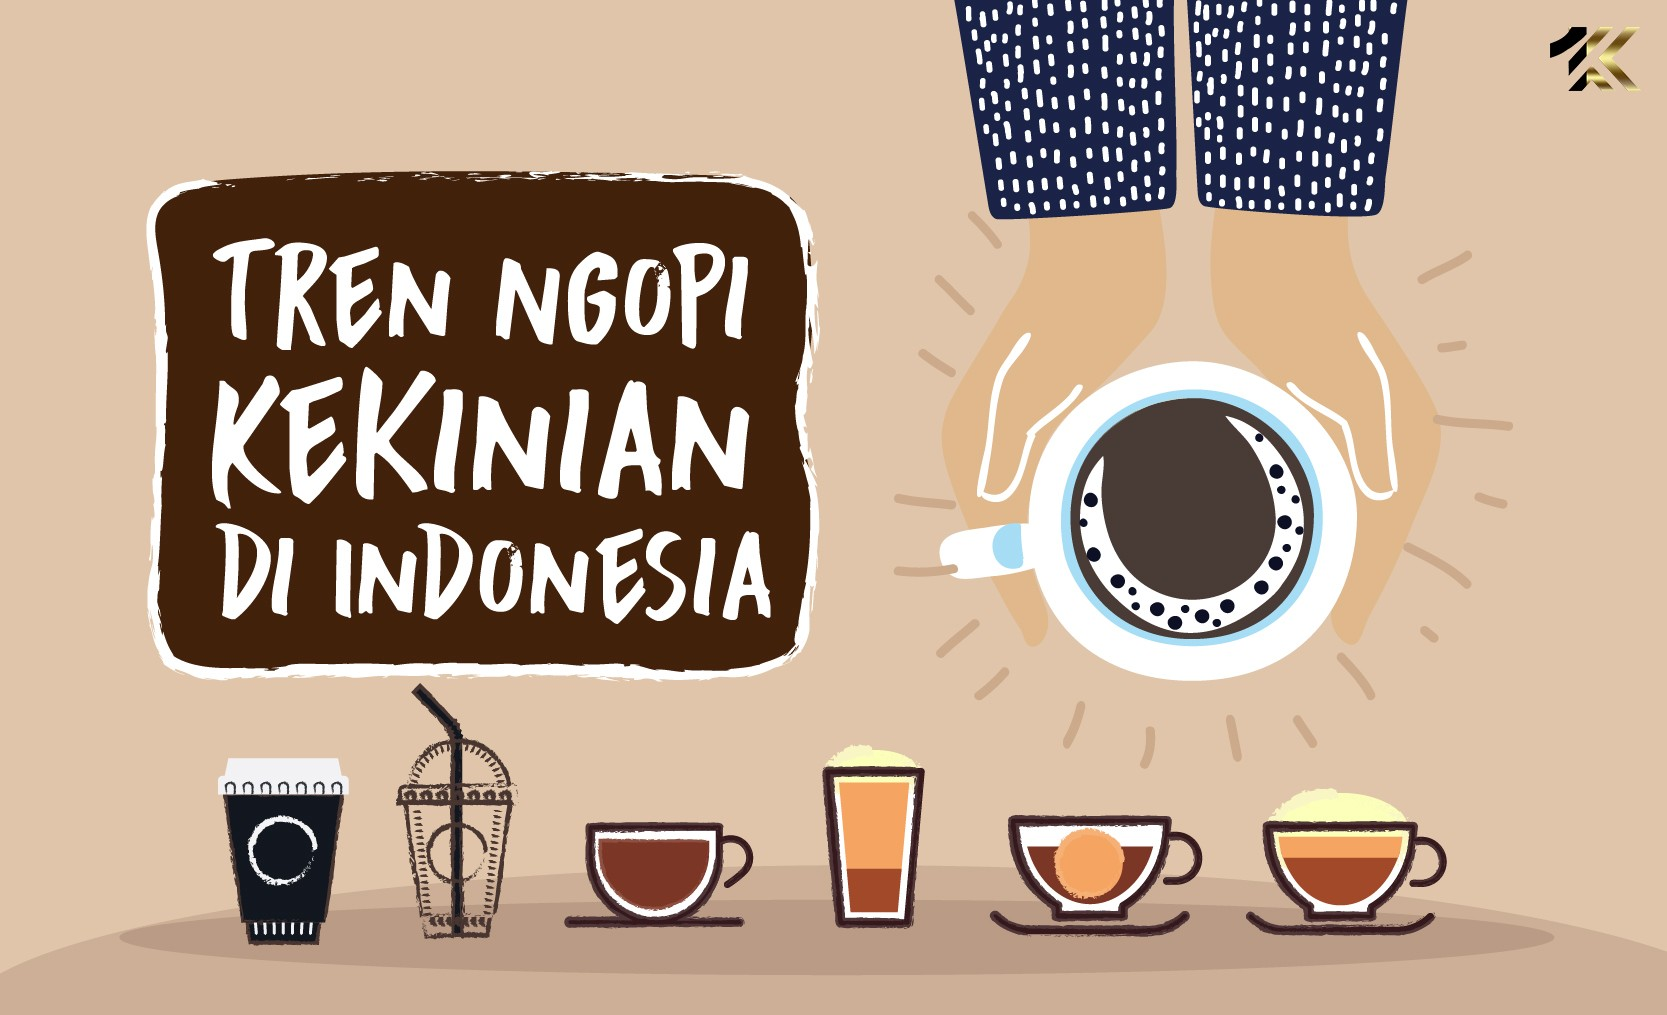 Tren Kopi Kekinian Di Indonesia